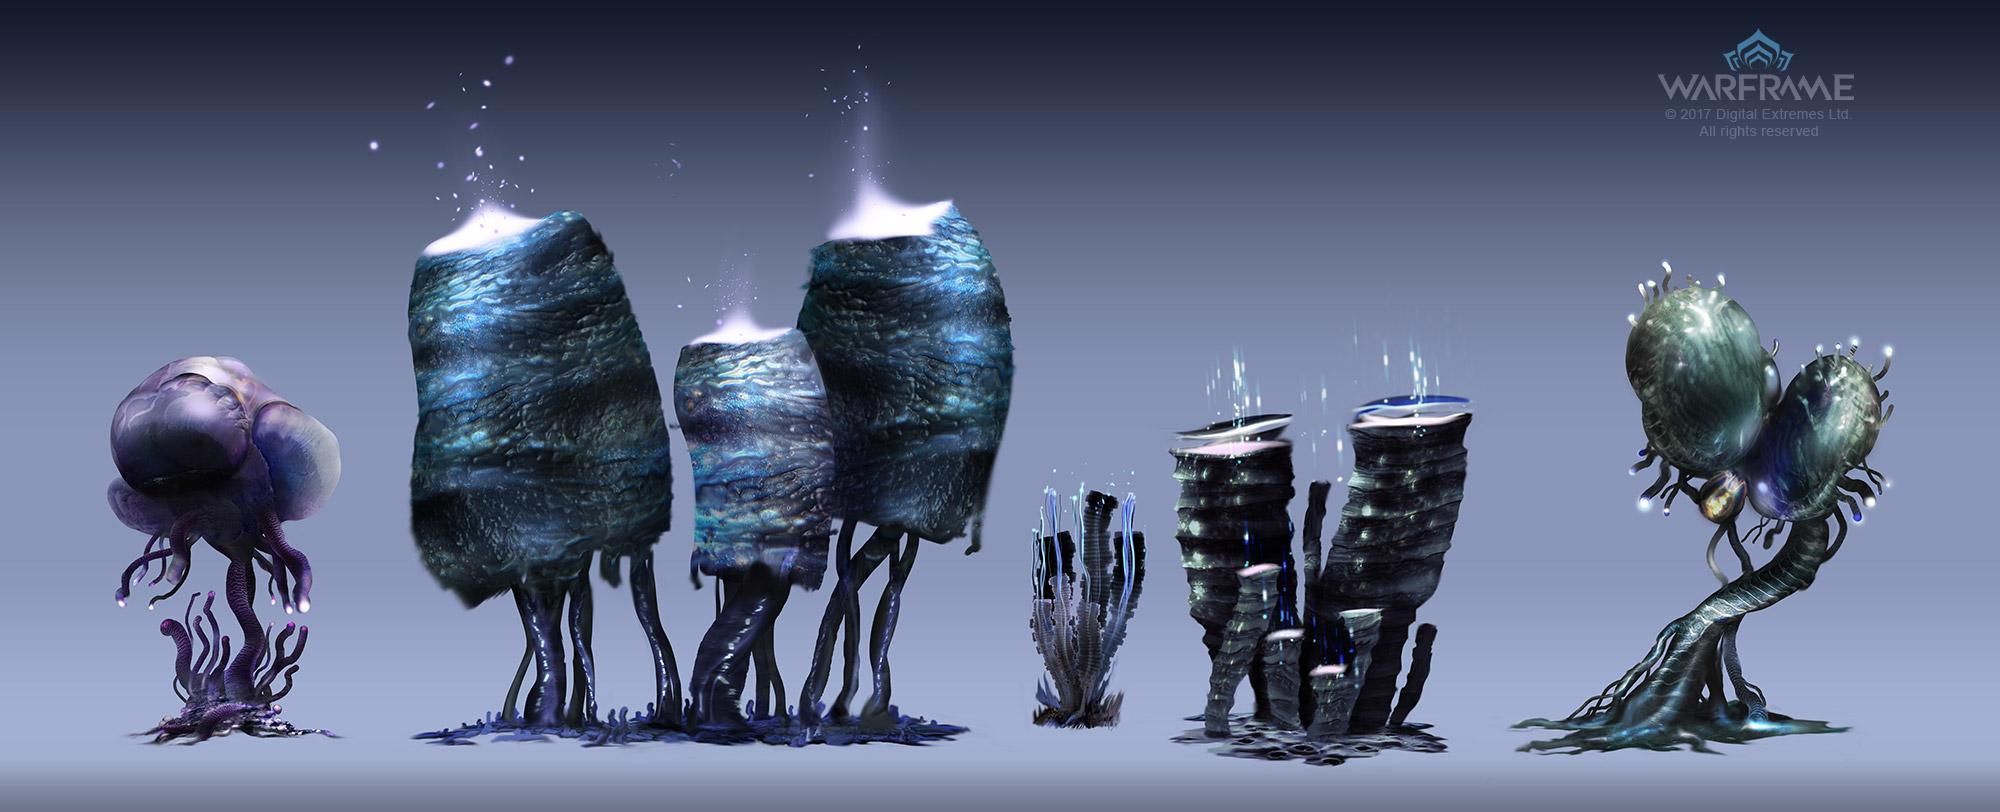 Warframe_Grineer_Underwater_Plants_A_01